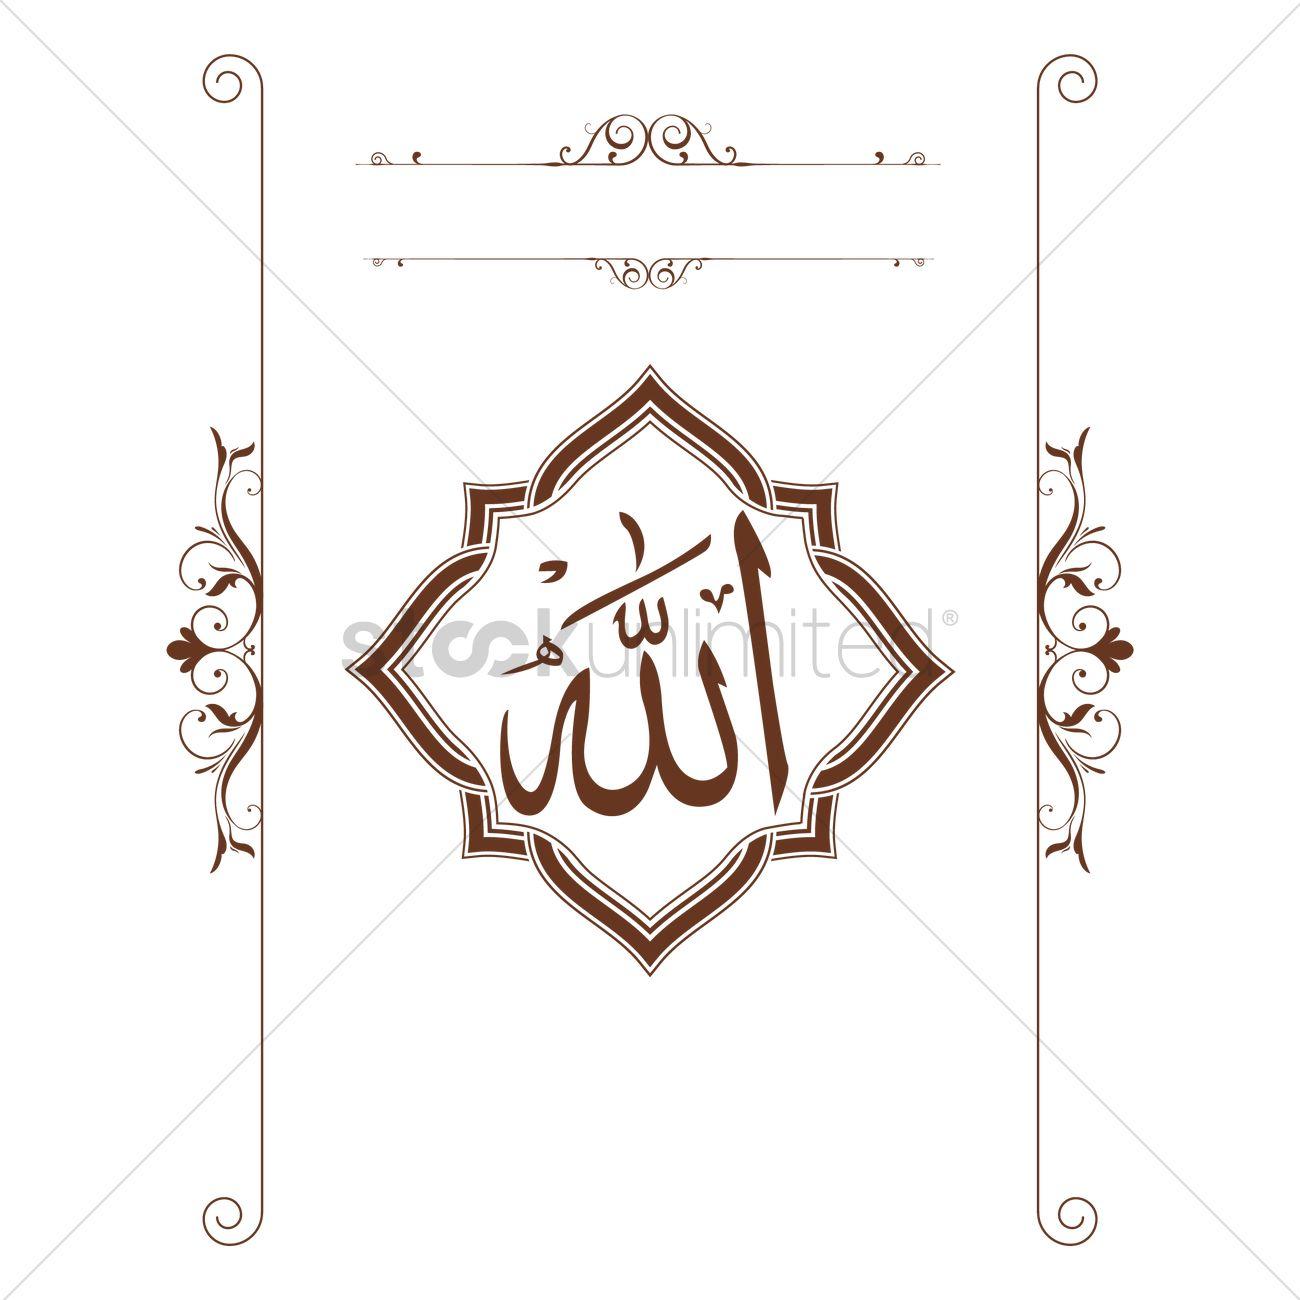 Islamic calligraphy wall art design Vector Image